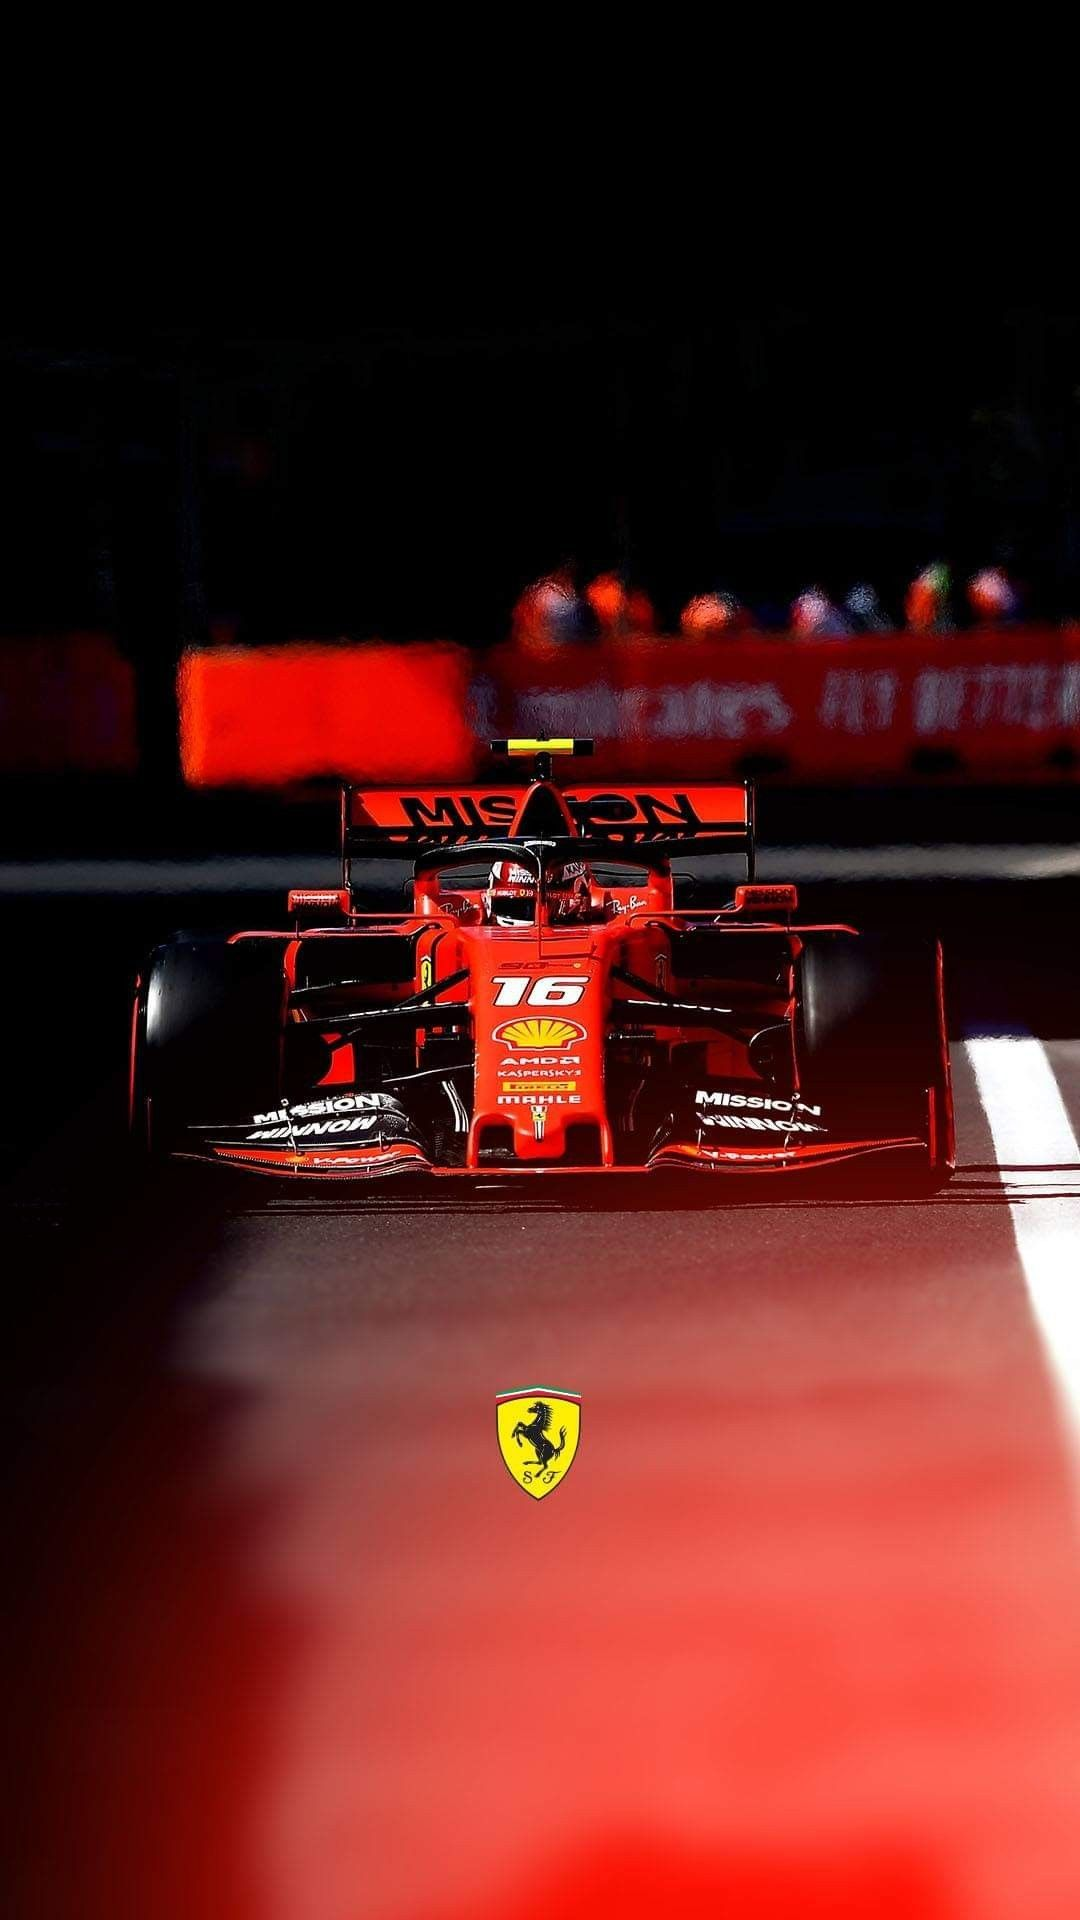 Lyqqurbjwqrcxkcxoalpmavuoqnfezevuuhnhjkeueccqwtwql In 2020 Ferrari Scuderia Formula 1 Car Formula One